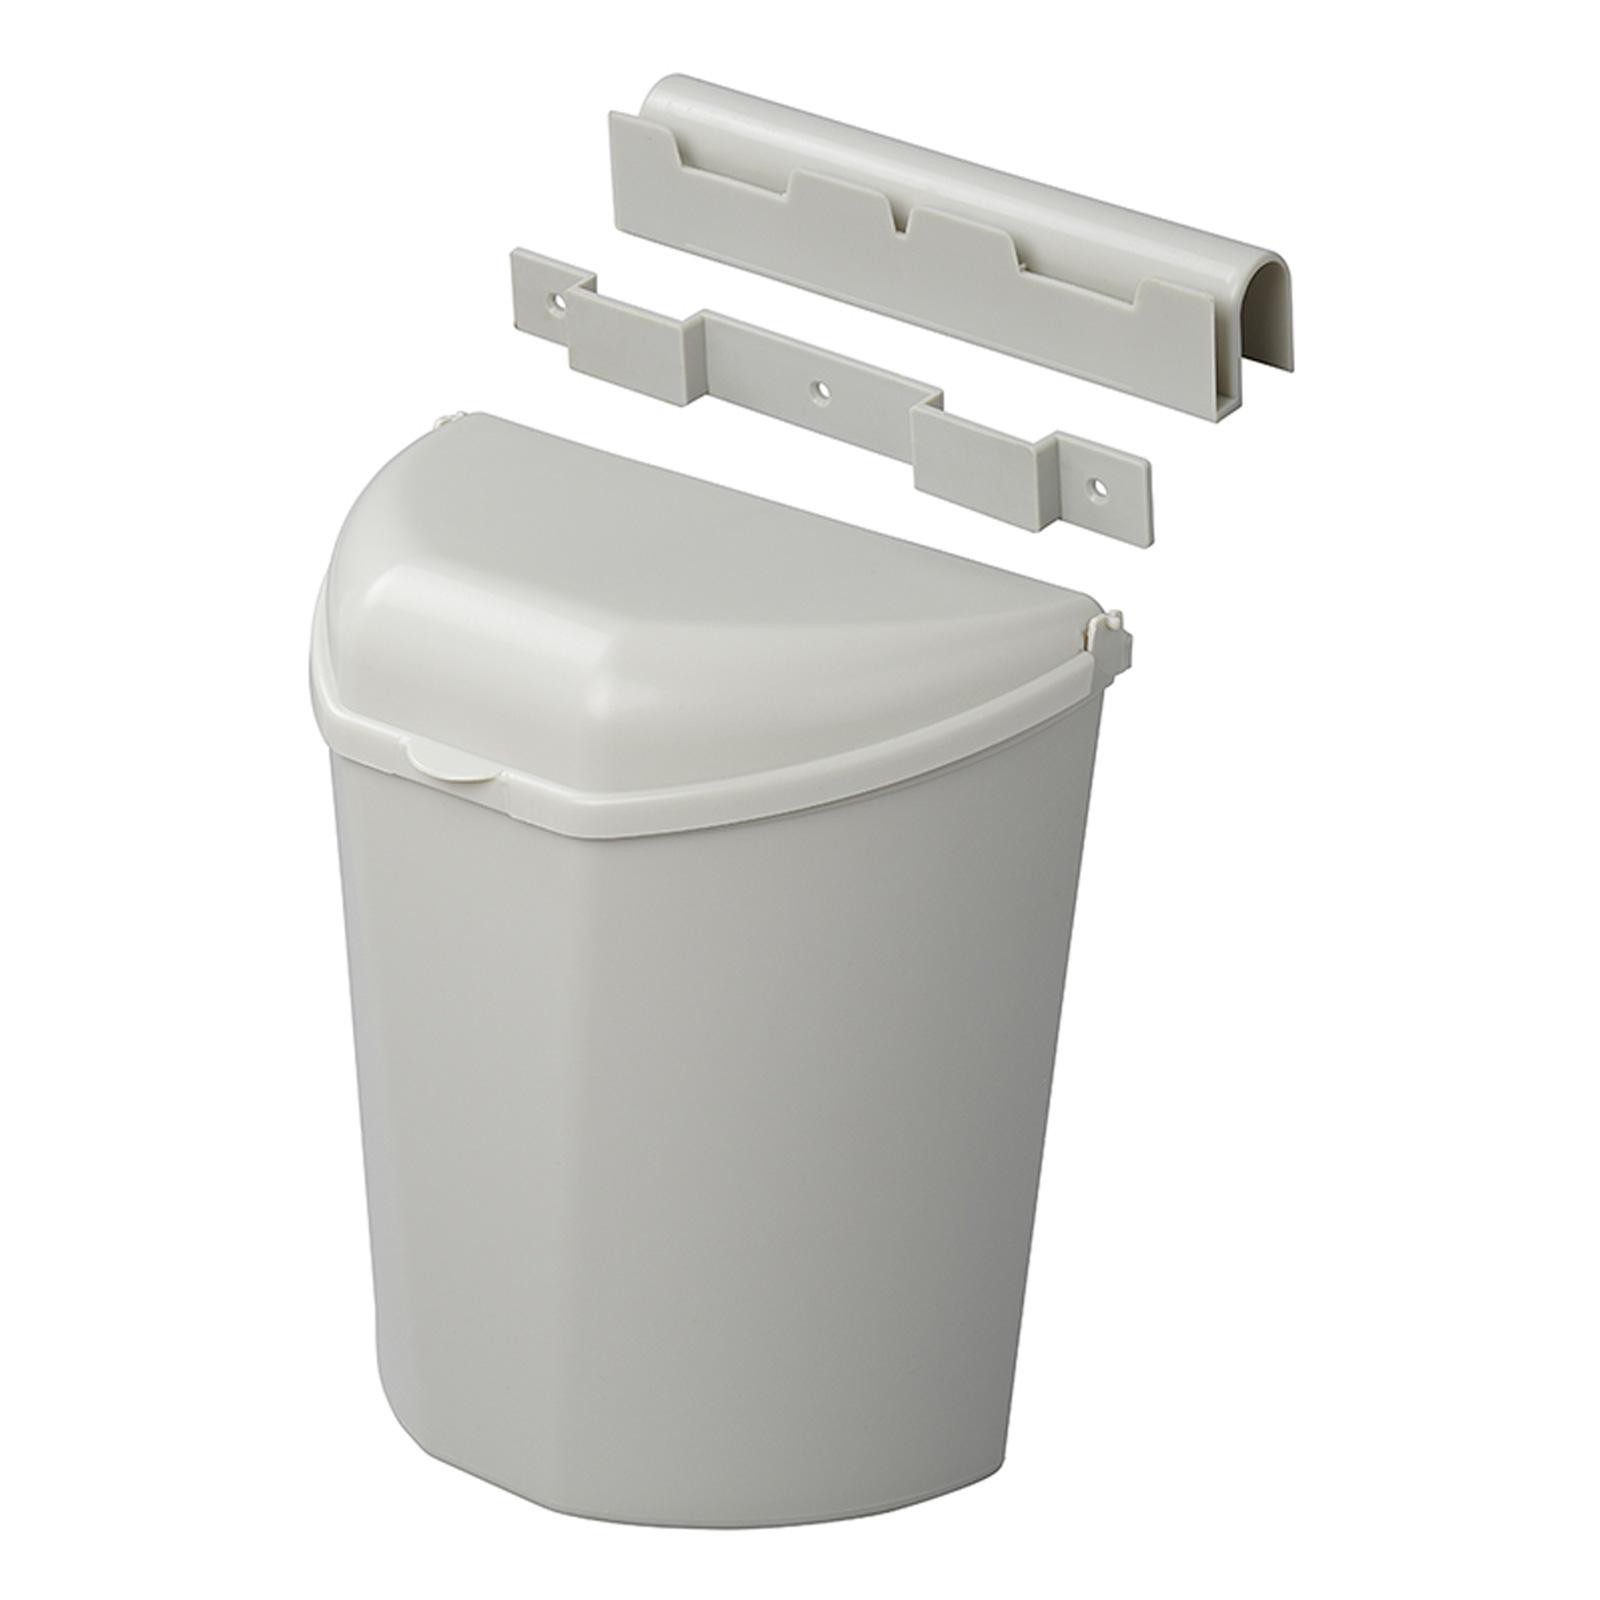 Abfalleimer grau, inkl. Halterung, kompaktes Maß 26,5x30x17 cm